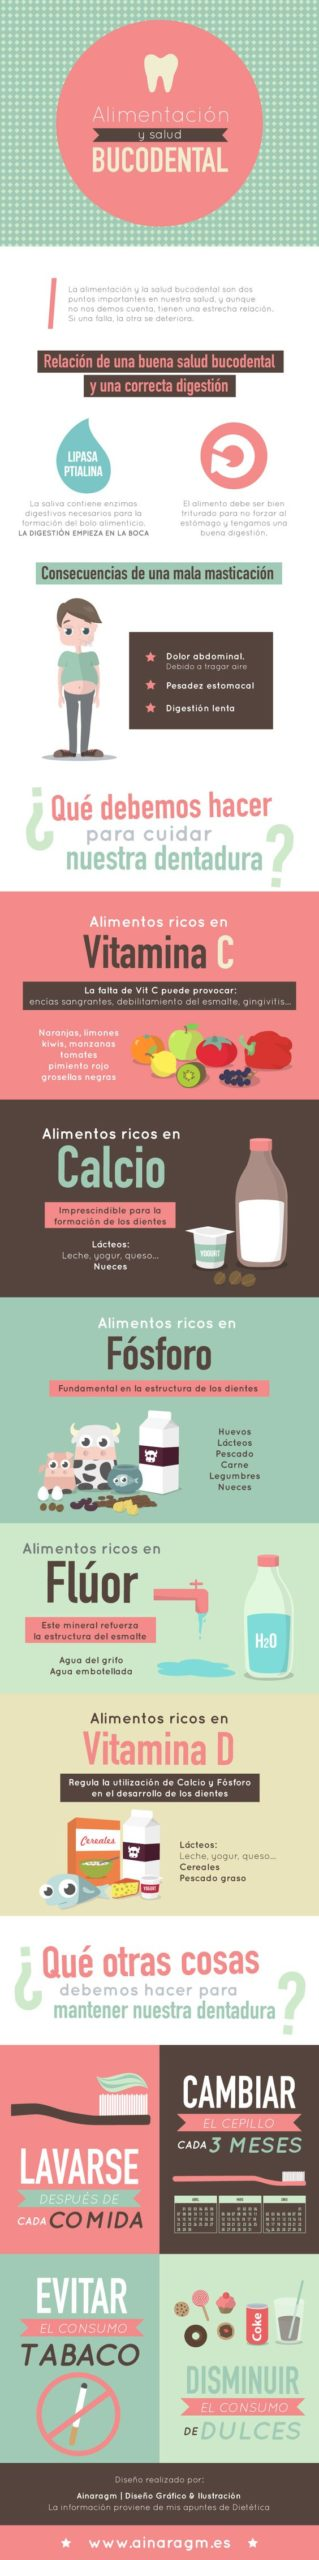 infografia nutricion y salud bucodental scaled